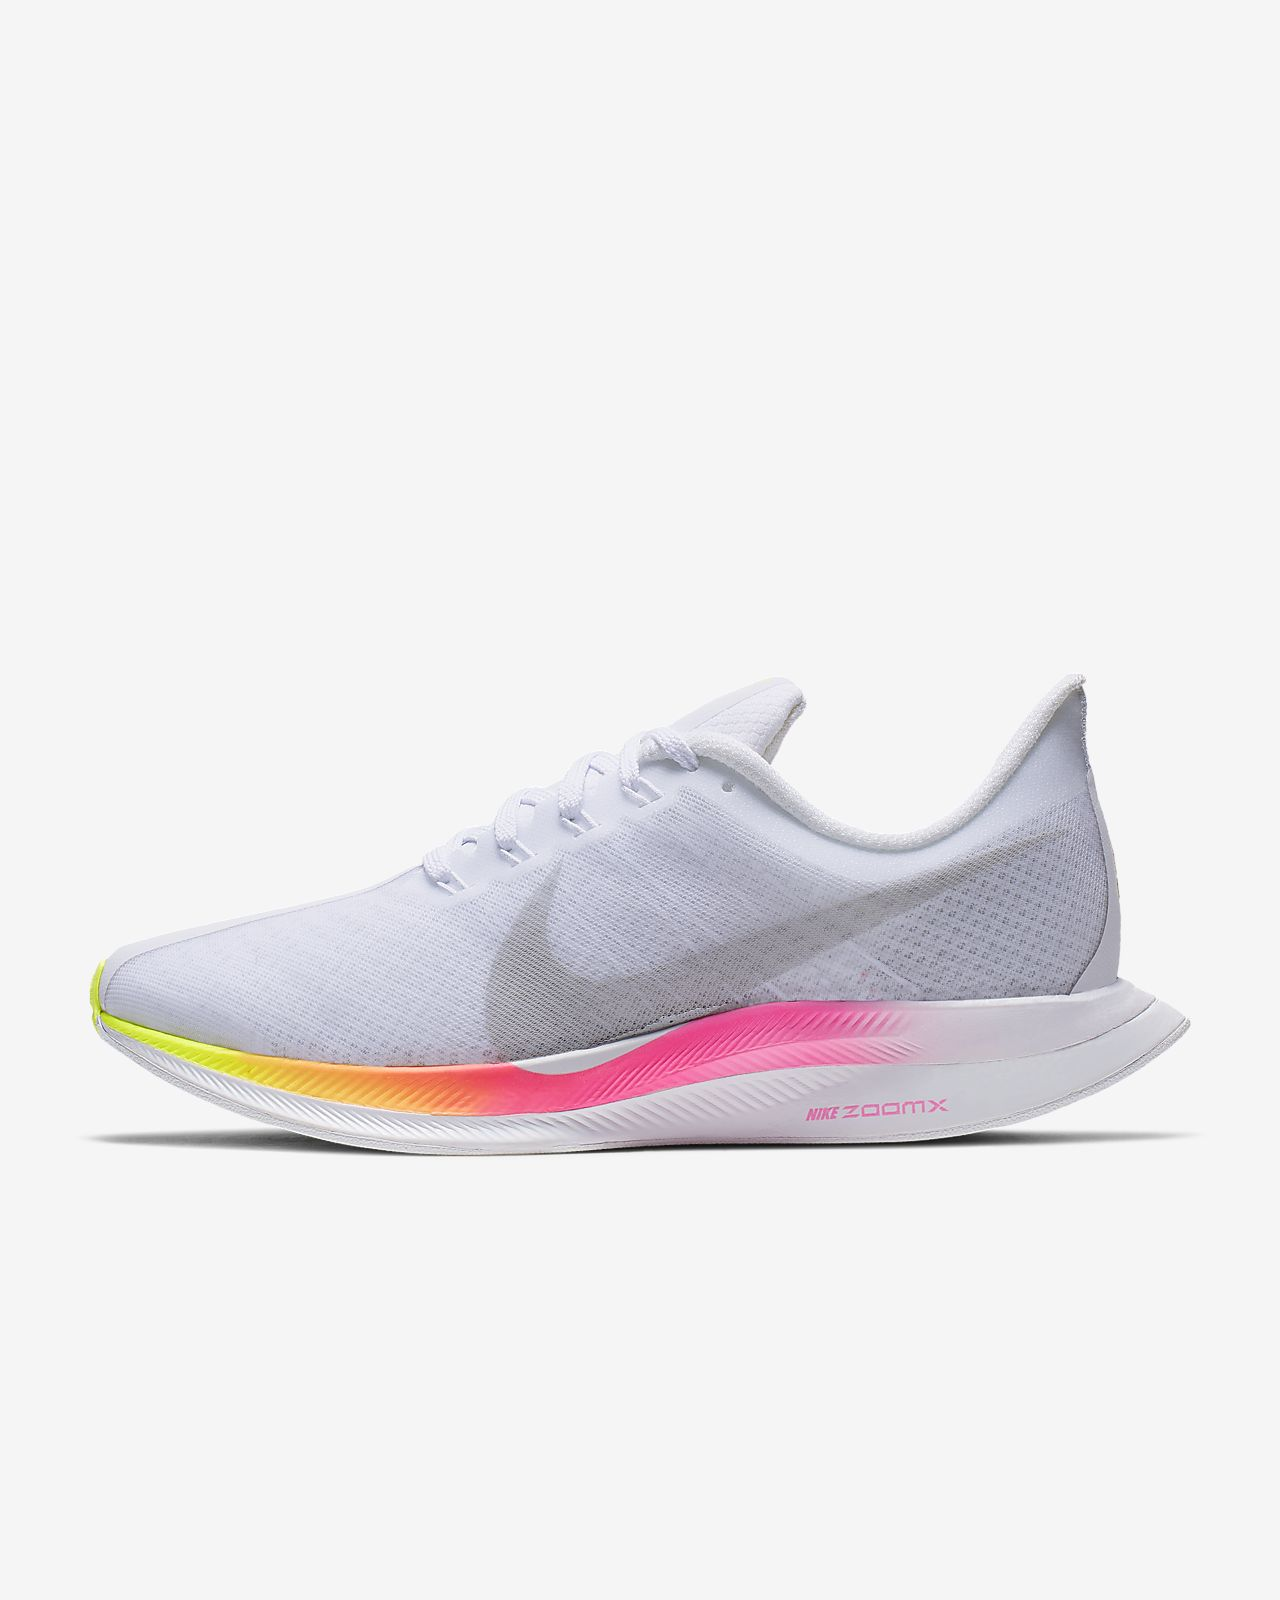 Löparsko Nike Zoom Pegasus 35 Turbo för kvinnor